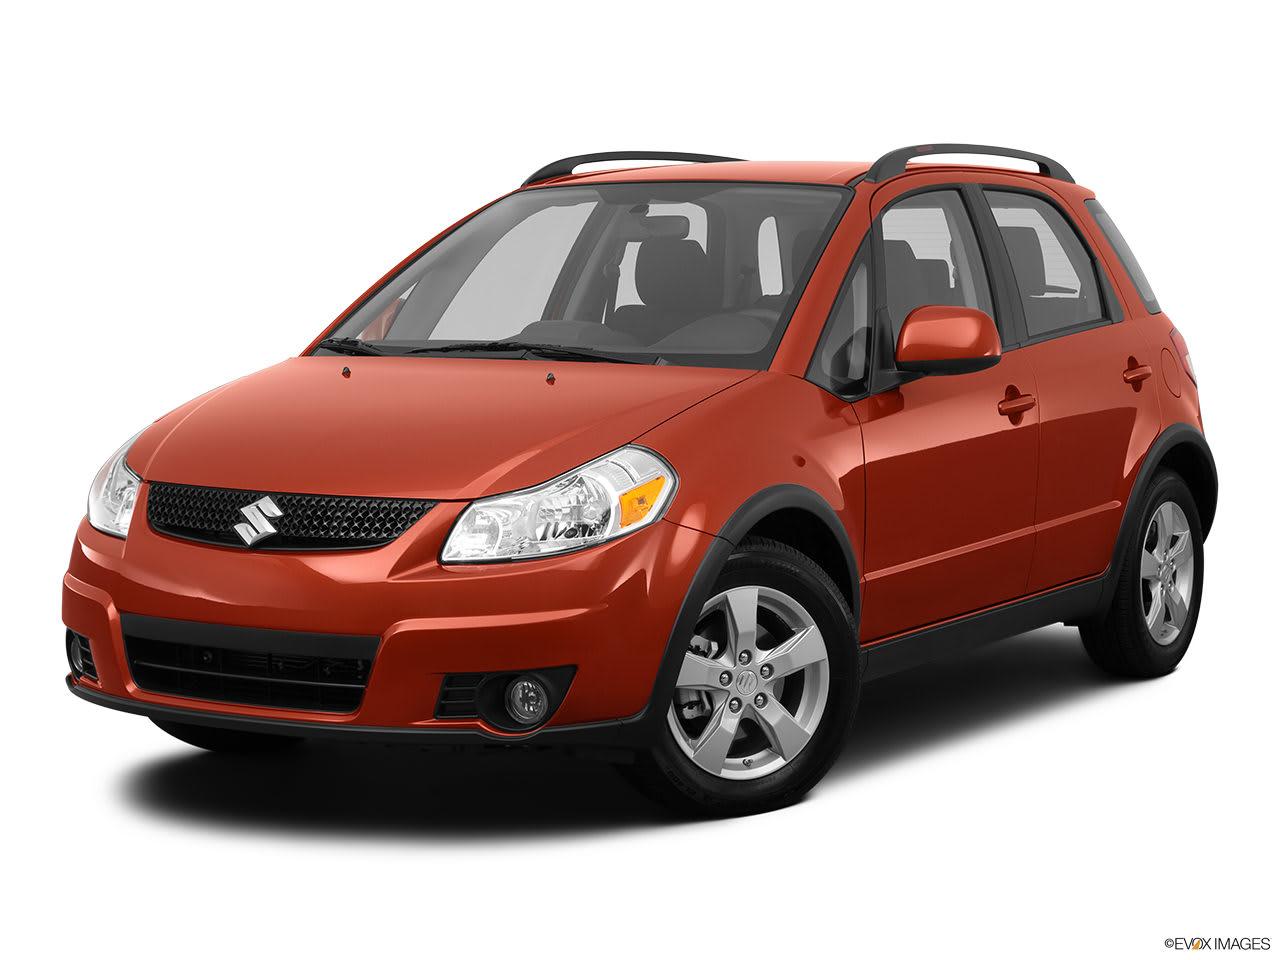 A Buyer's Guide to the 2012 Suzuki SX4 | YourMechanic Advice